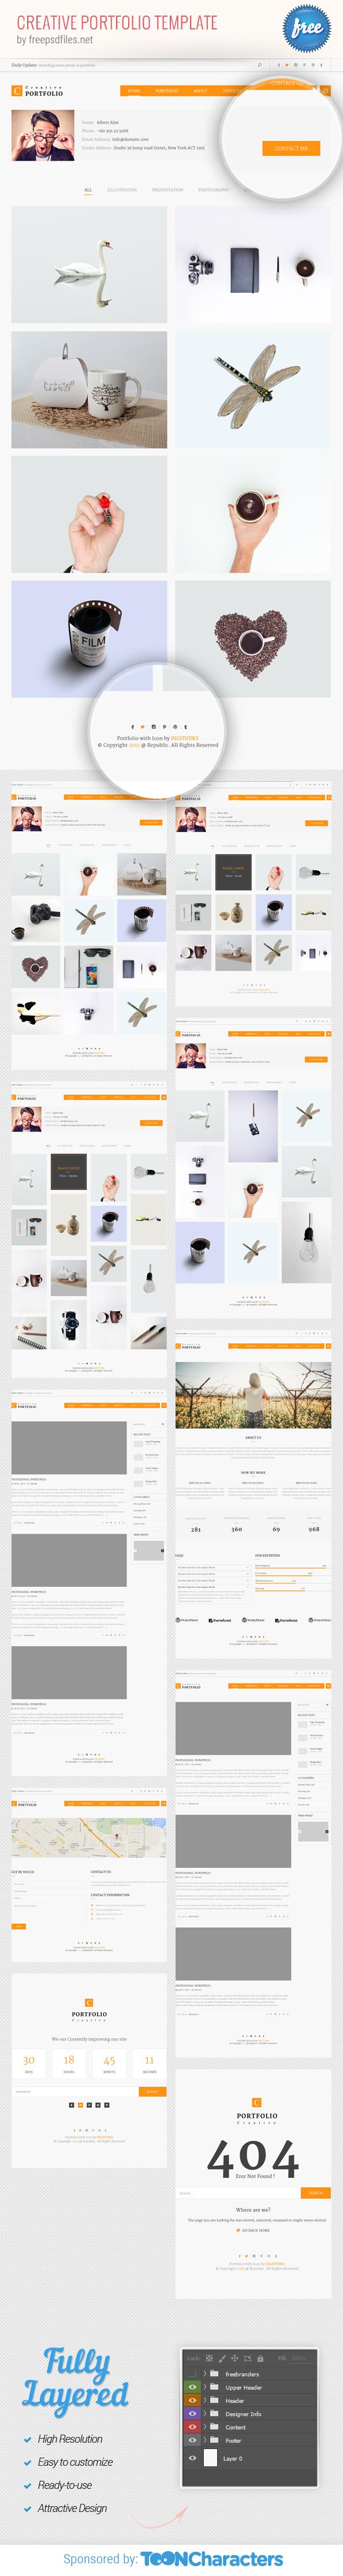 Free PSD Creative Portfolio Template